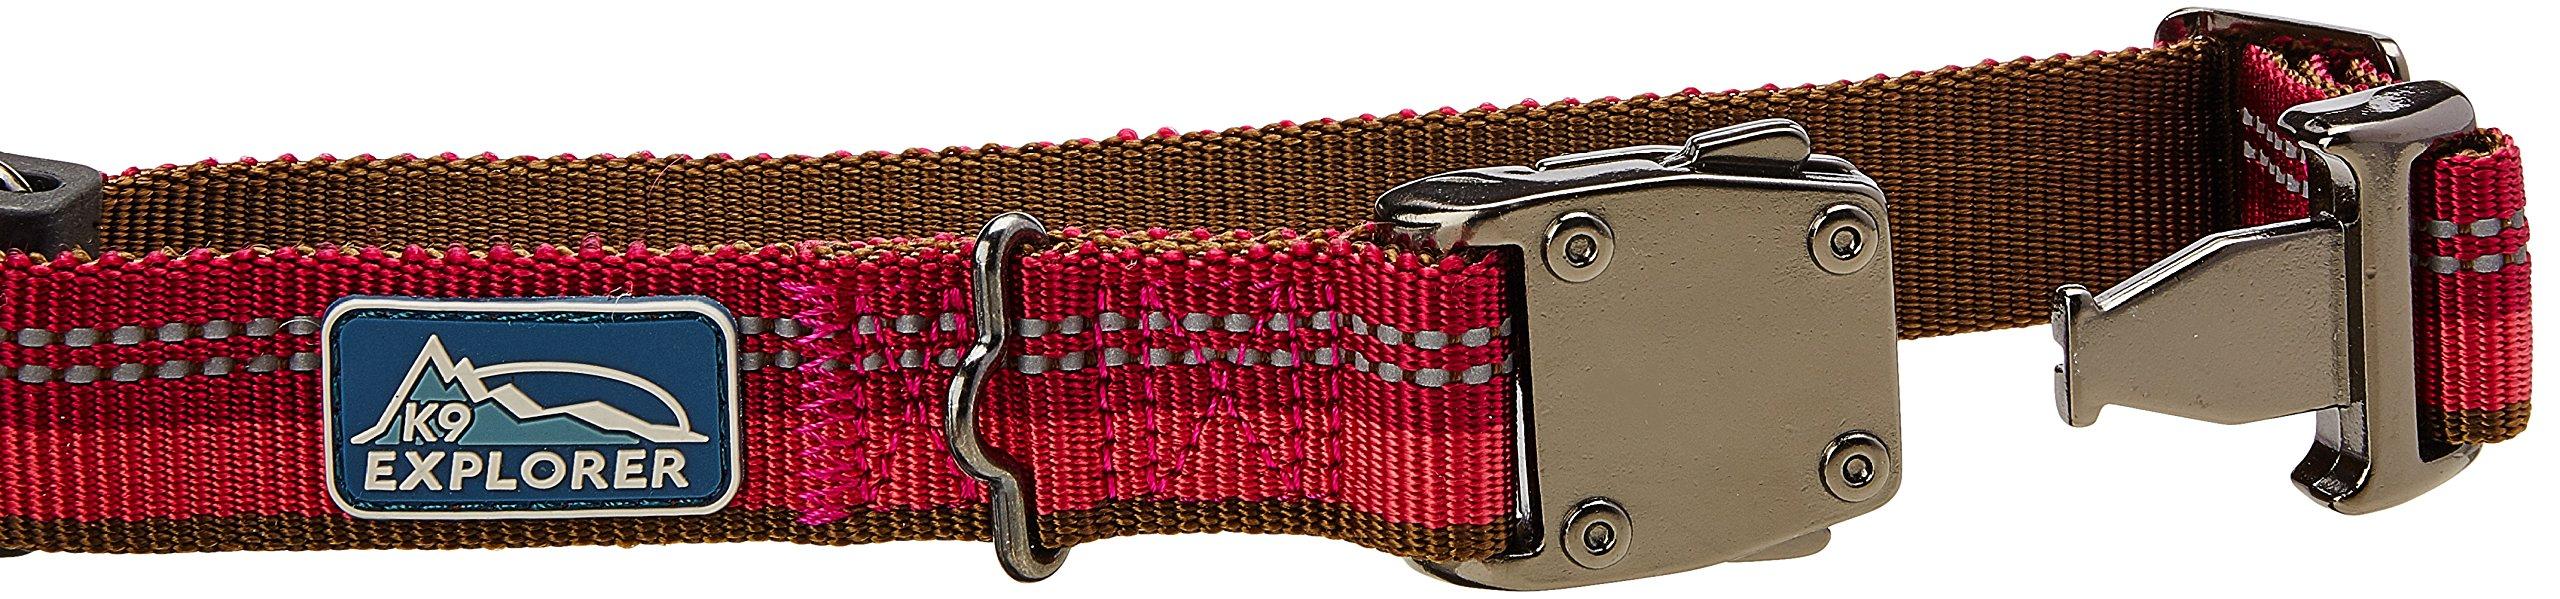 Coastal Pet Products DCP36922BRY K9 Explorer 1-Inch Dog Collar, Medium, Berry by Coastal Pet (Image #2)